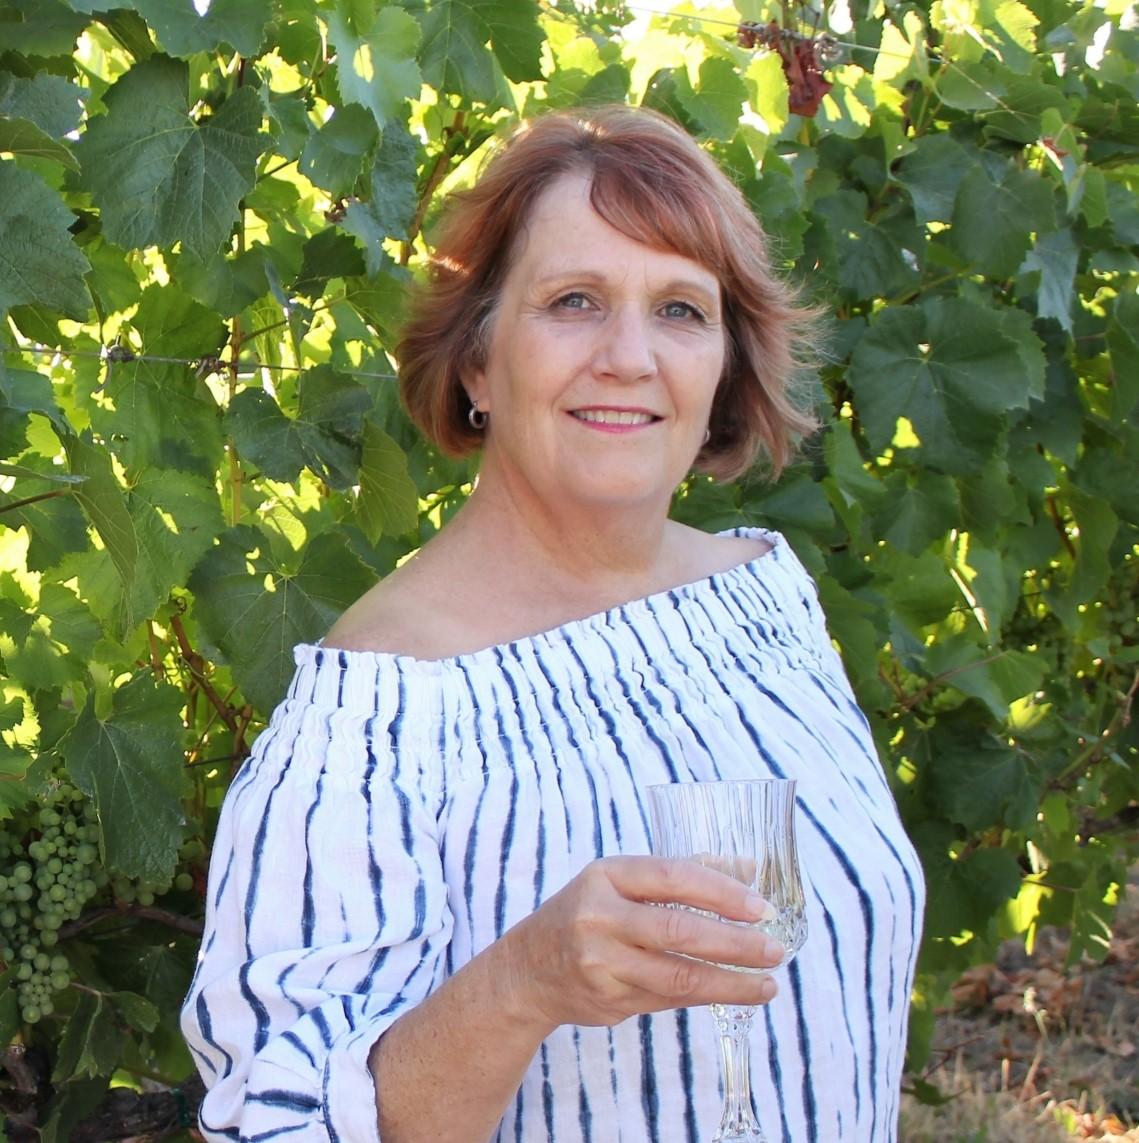 Rebecca in the vineyard